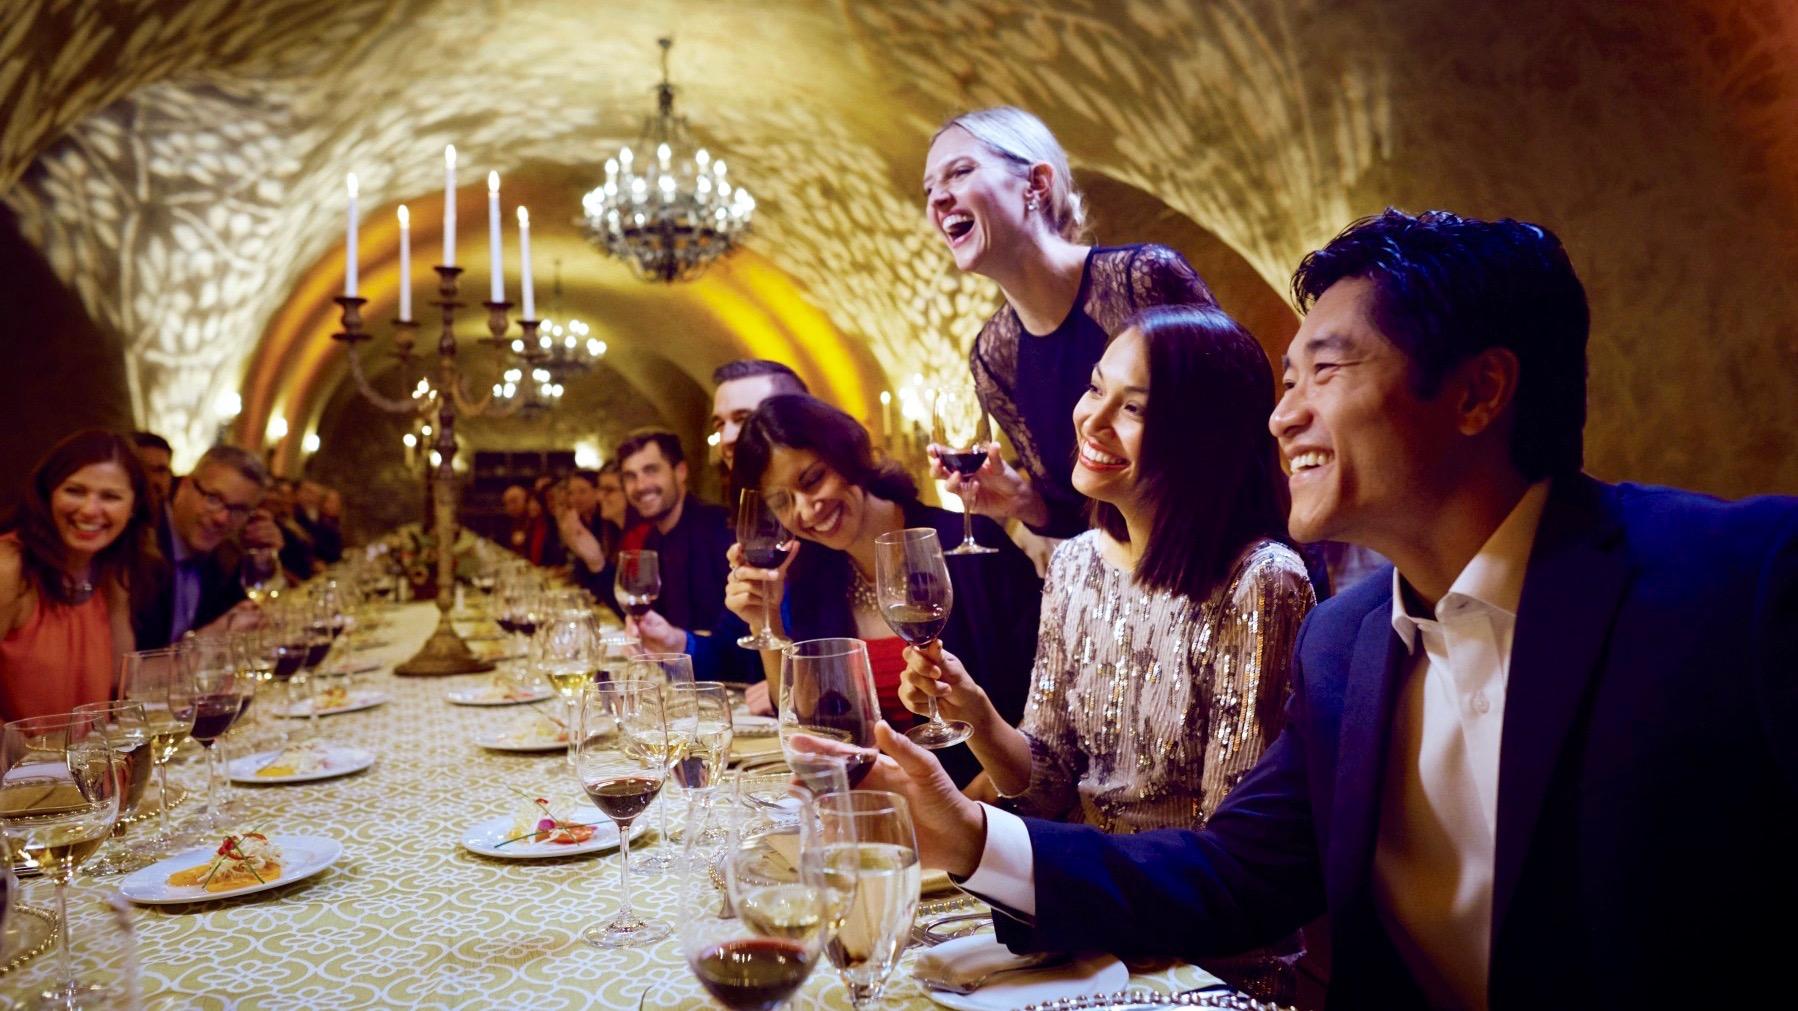 2017 Masters Winemaker Dinner Series at Napa's Meritage Resort, Healthy Living + Travel